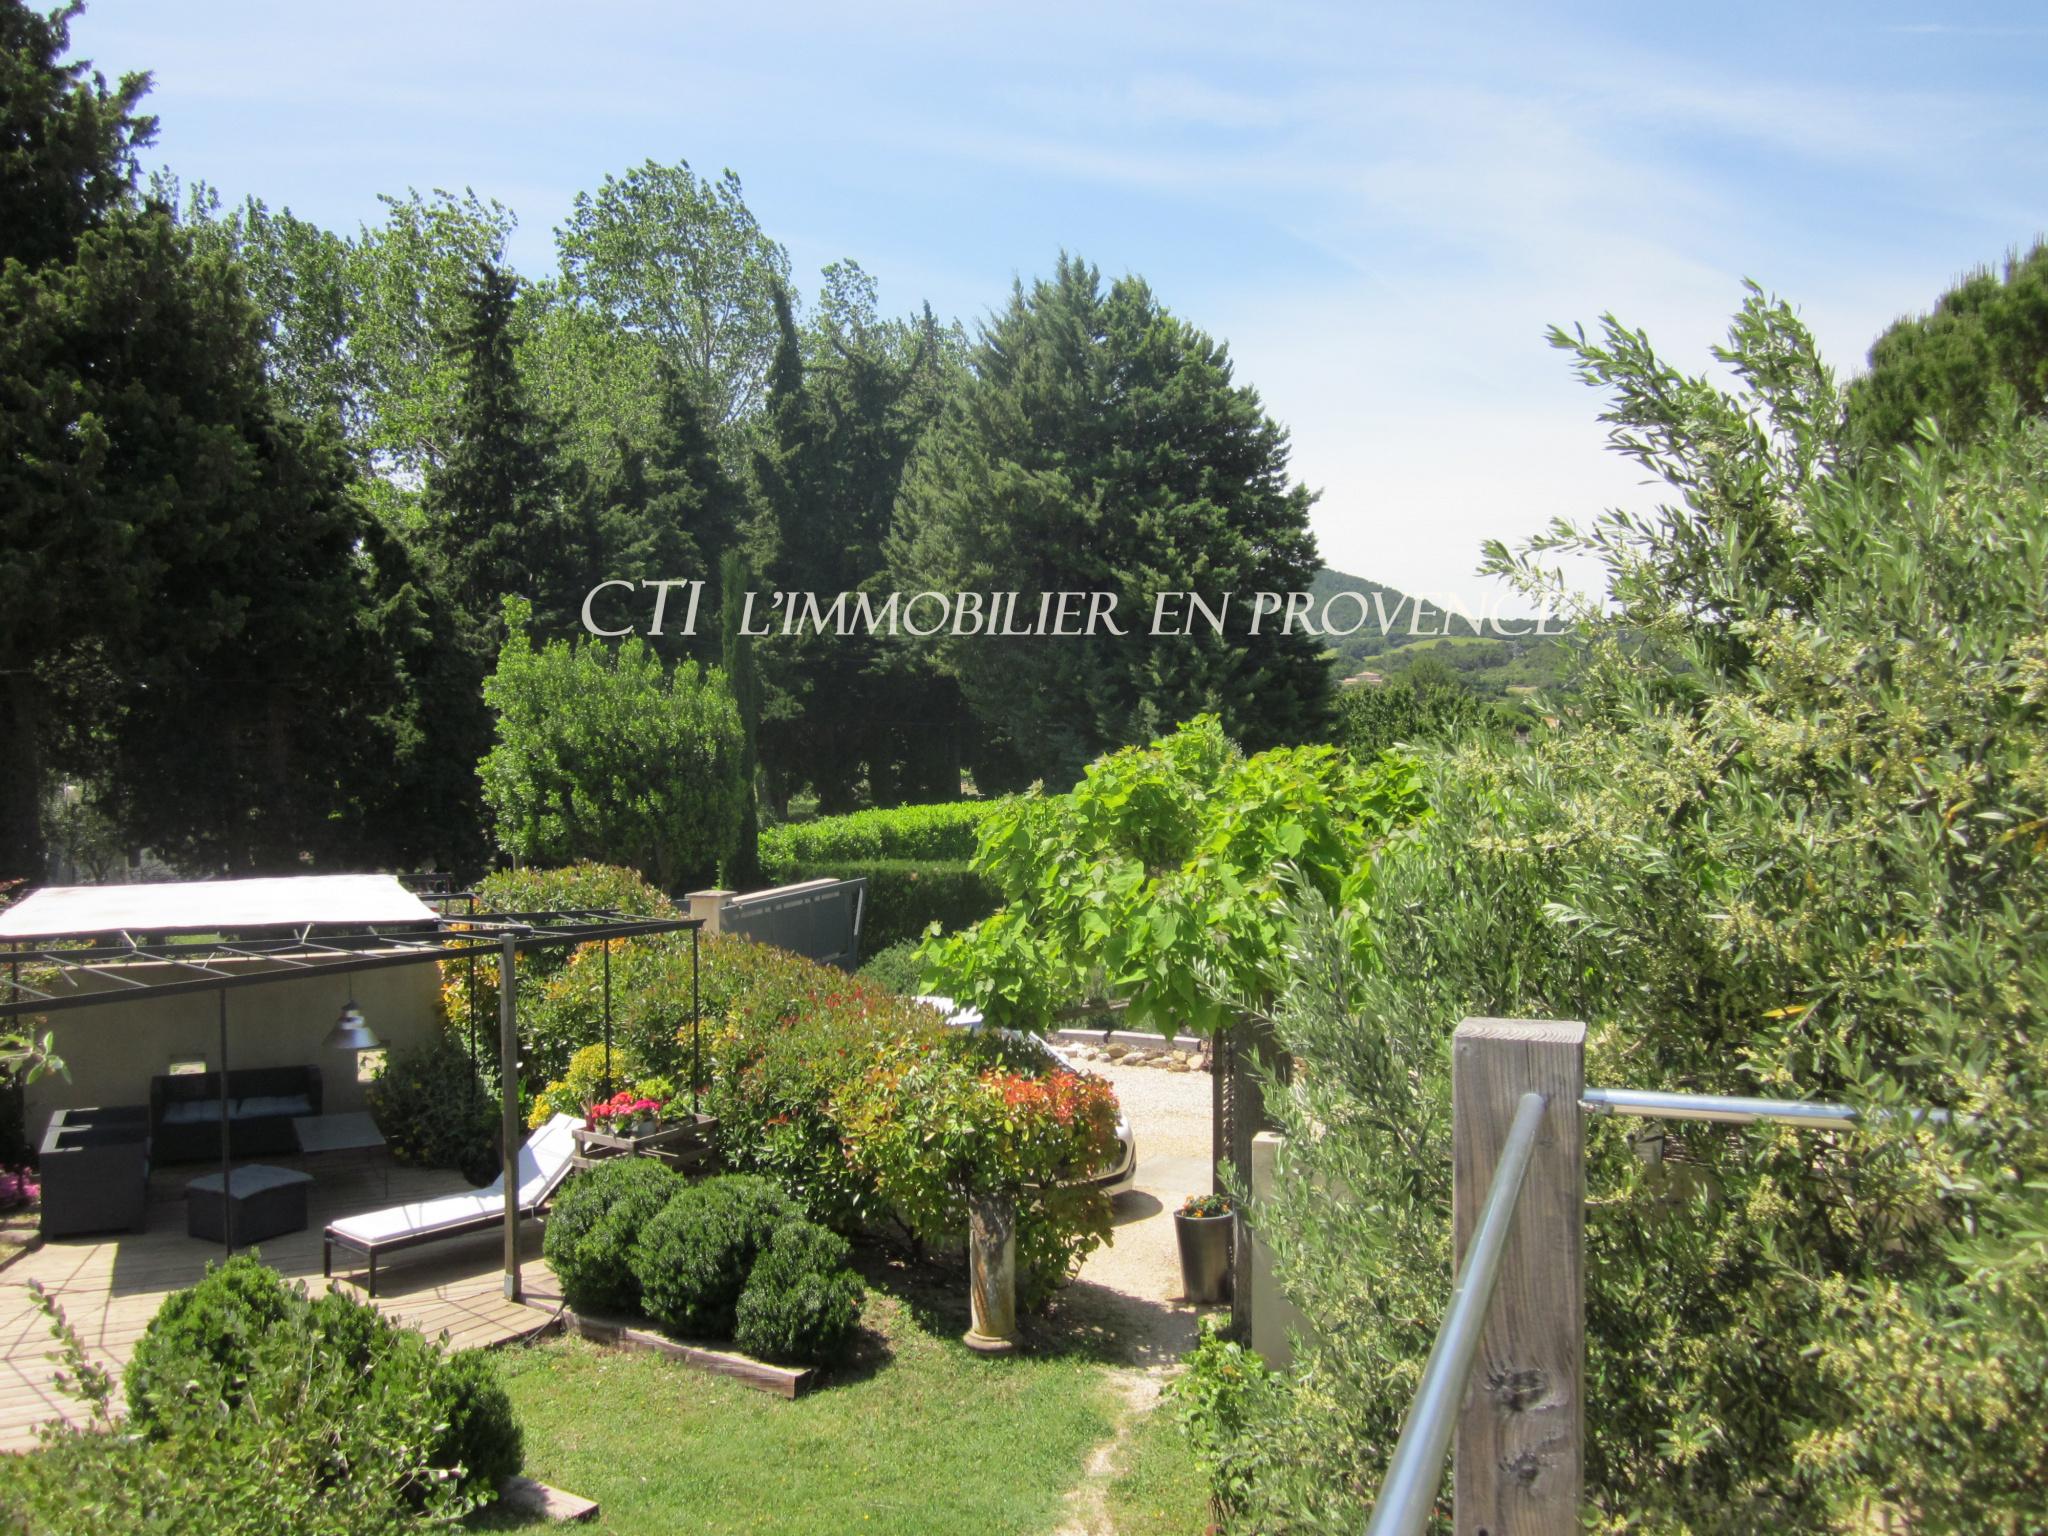 0 A VENDRE www.cti-provence.net MAISON VUE CAMPAGNE  VAISON LA ROMAINE JARDIN GITE CHAMBRE HOTE